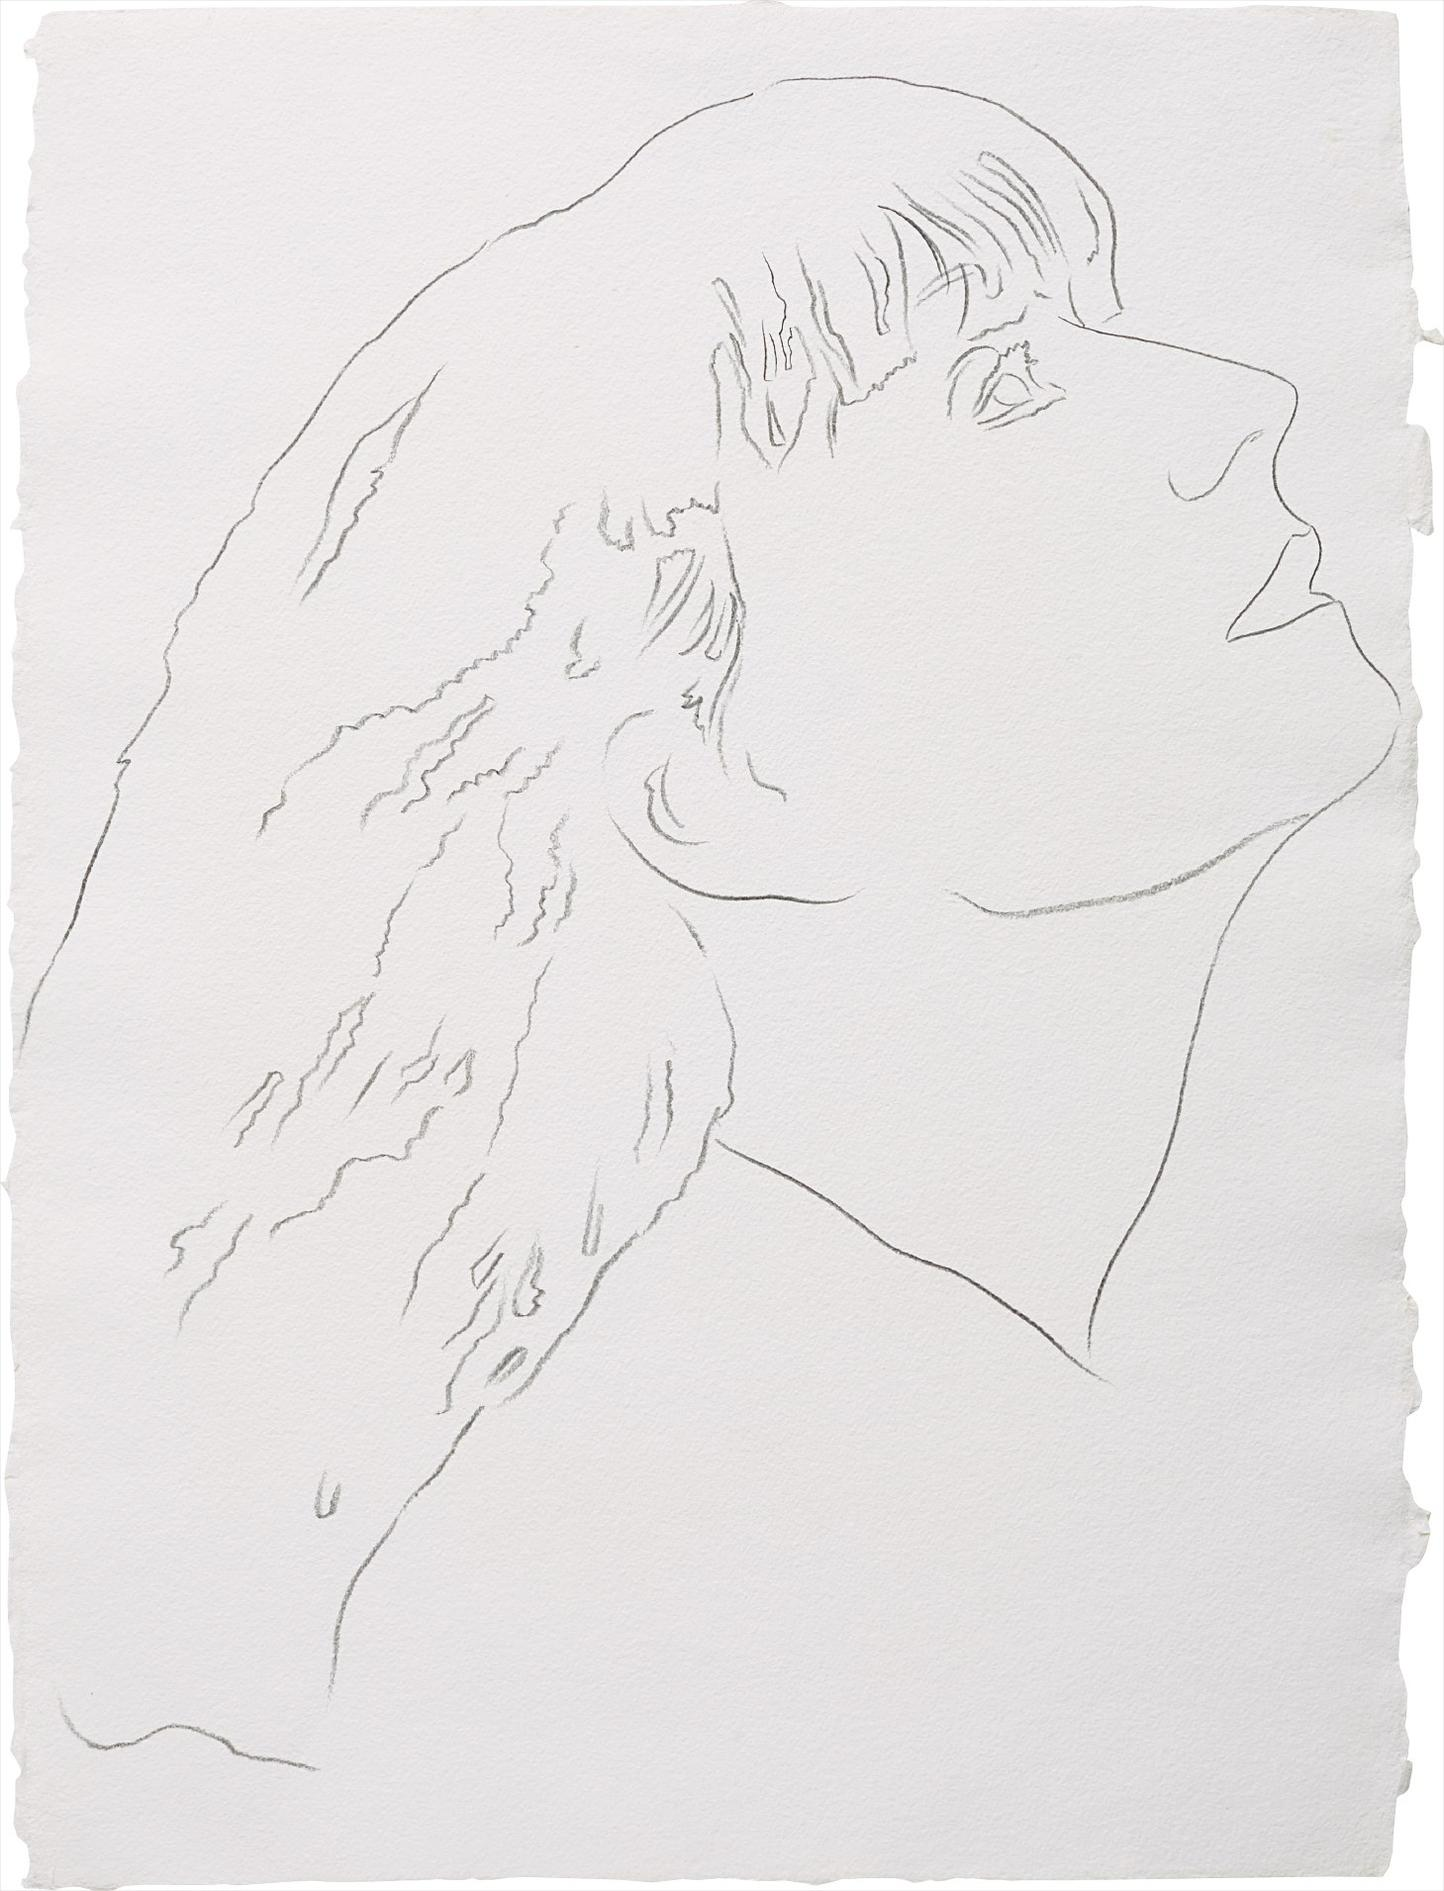 Andy Warhol-Sonia Rykiel-1982